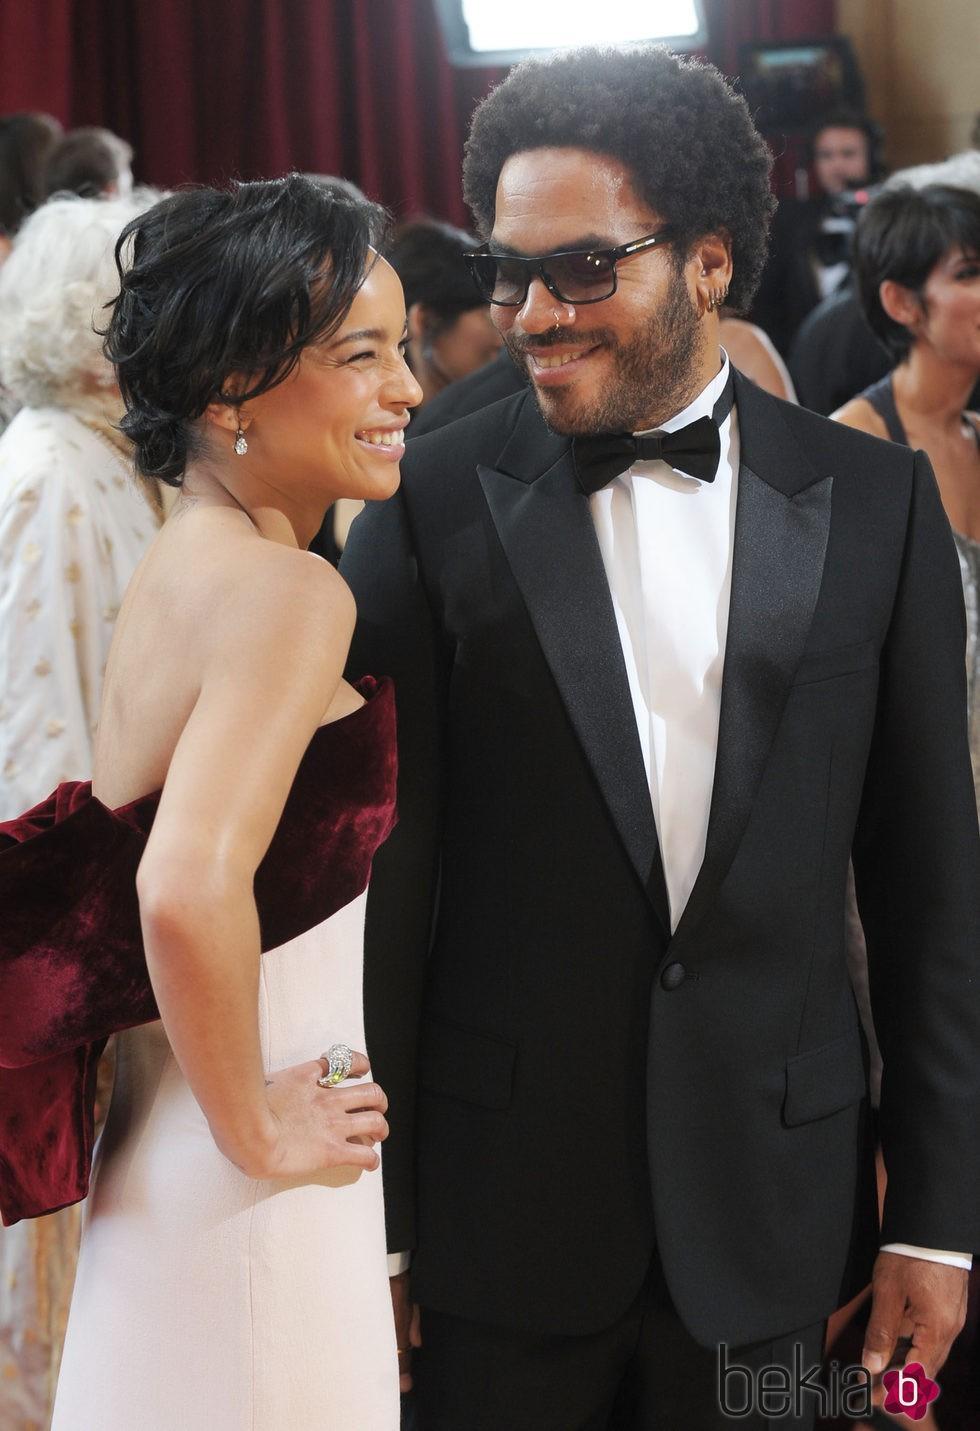 Zoë Kravitz con su padre Lenny Kravitz en una alfombra roja